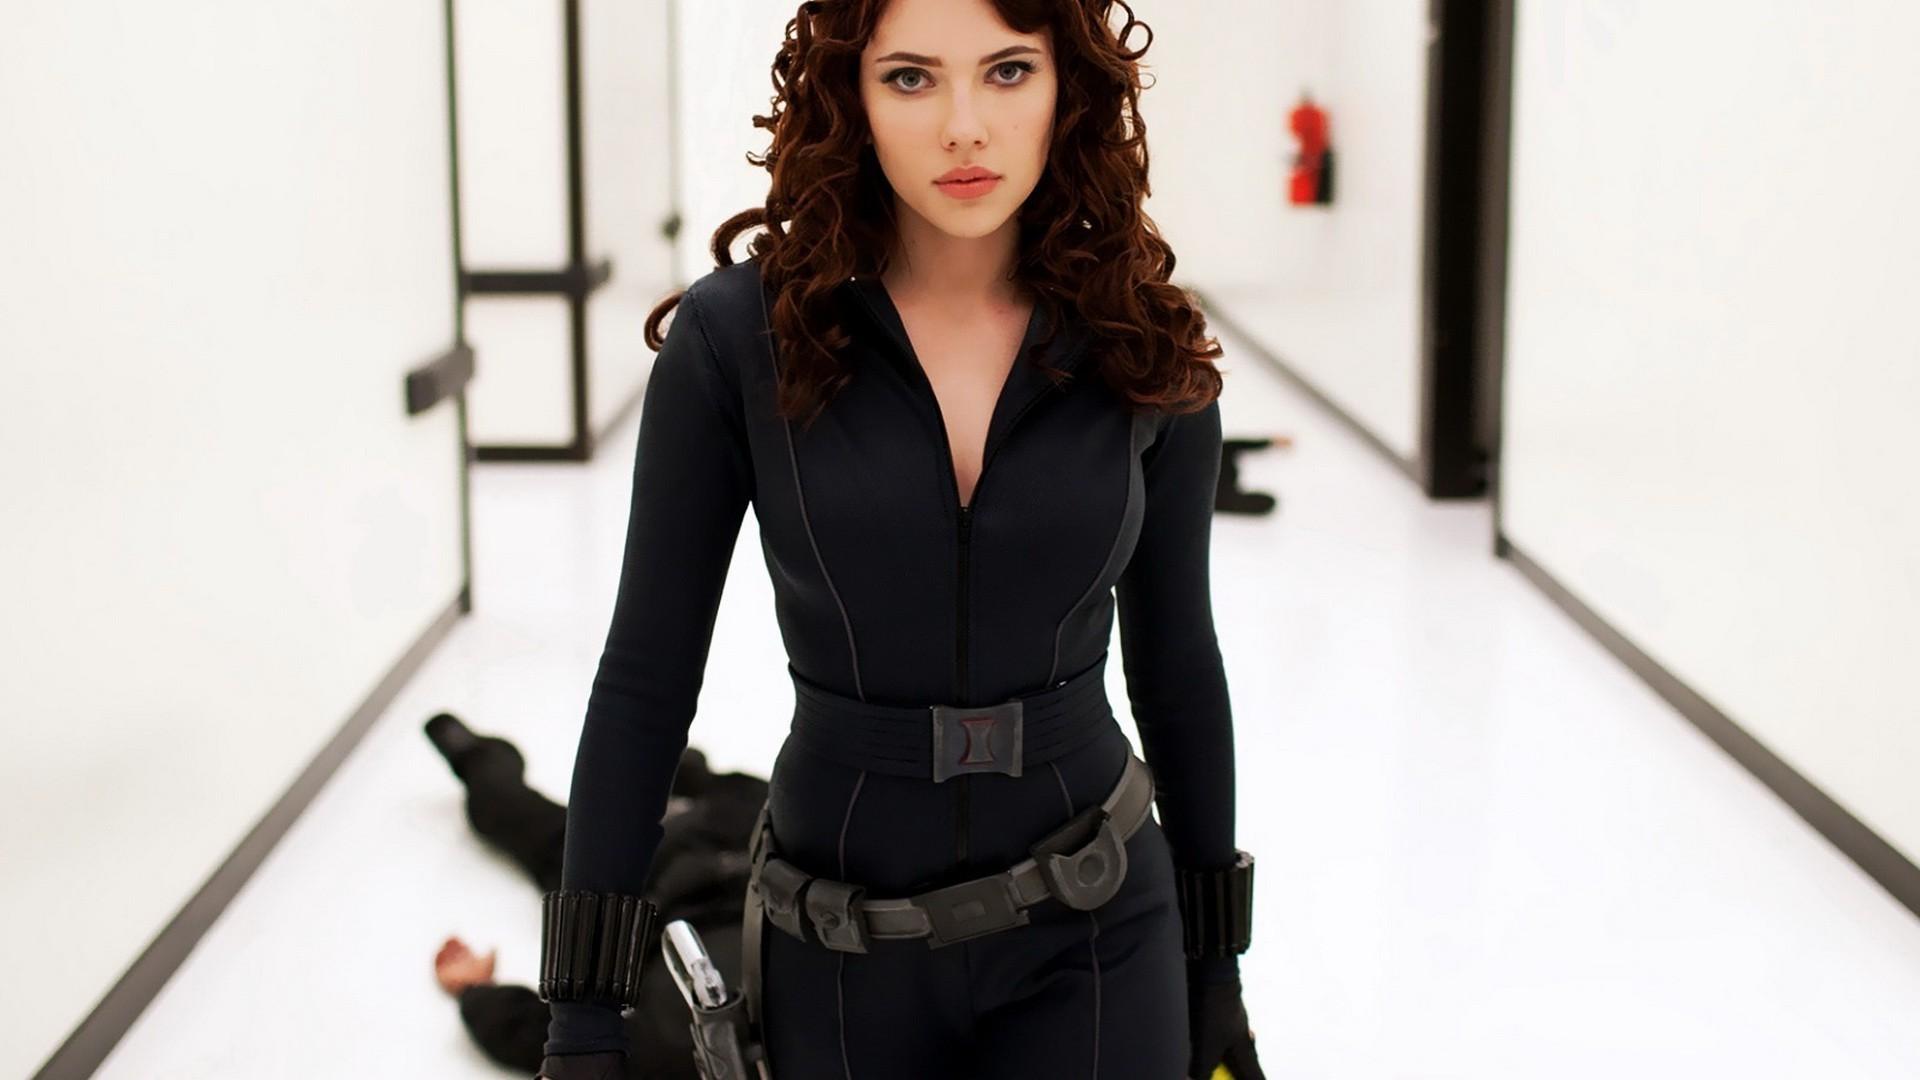 Natasha Romanoff Iron Man wallpaper